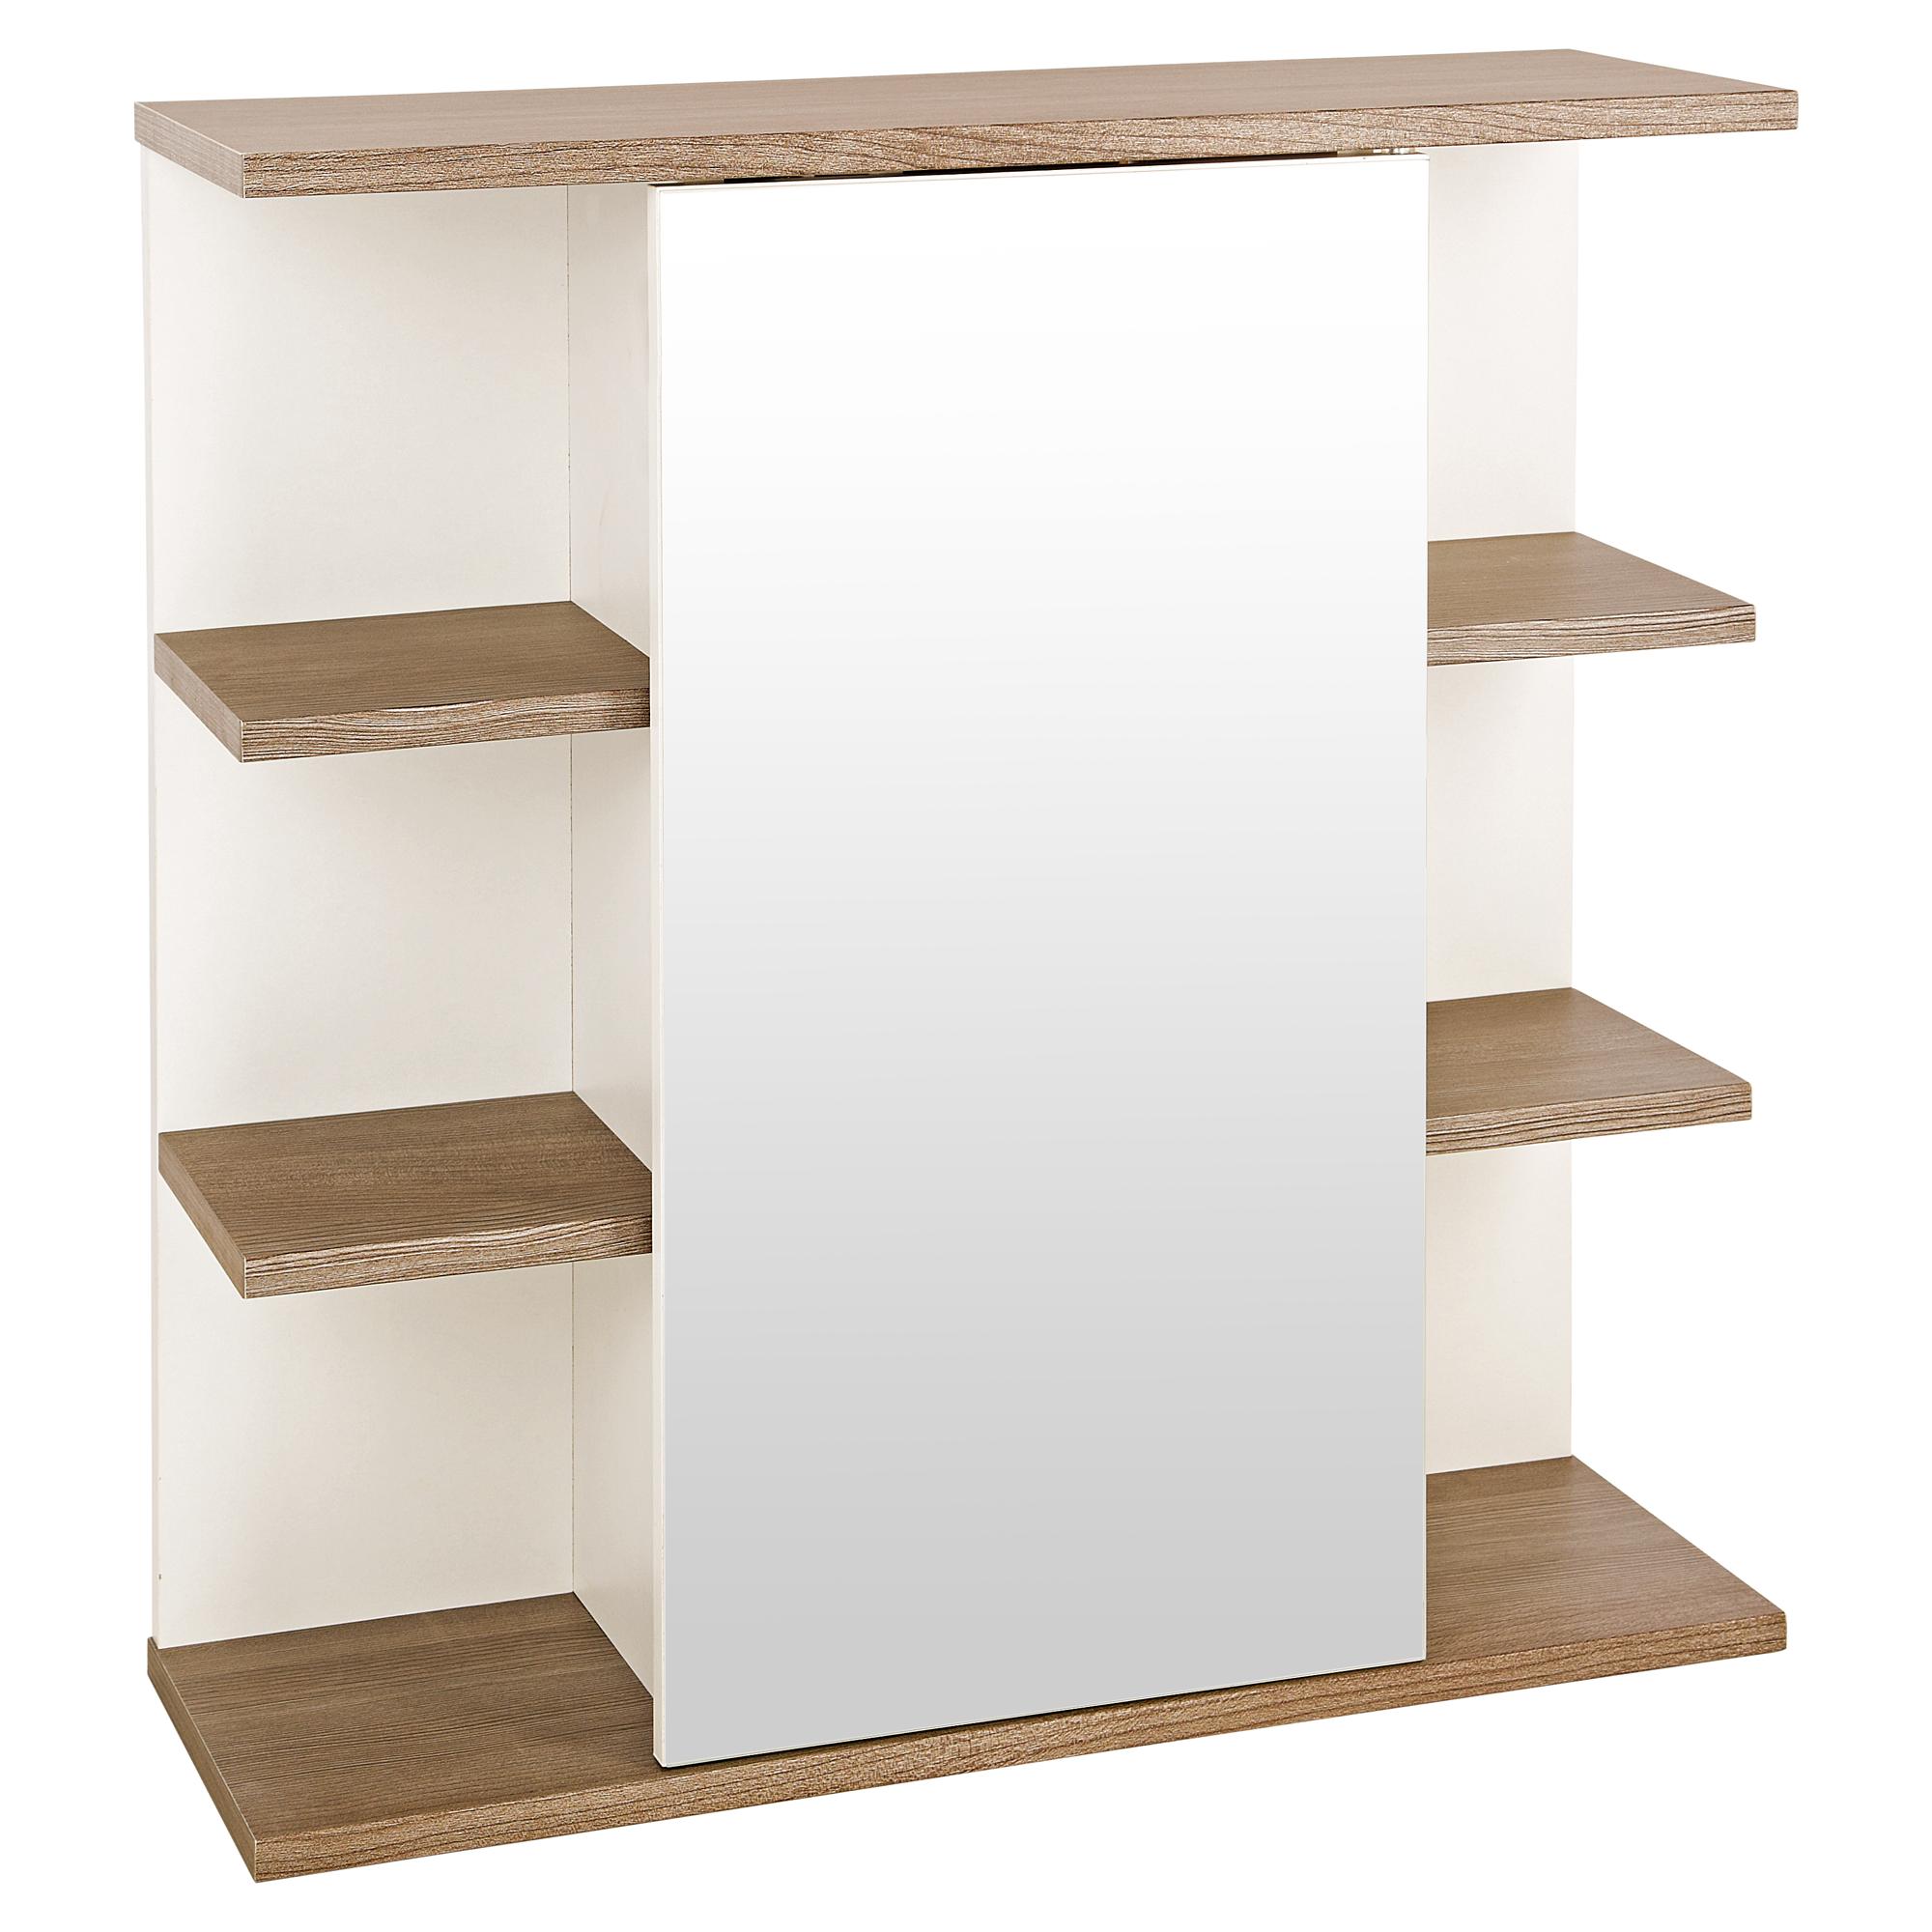 Ikea spiegelschrank holz  Holz Spiegelschrank: Mdf holz ganzkörperansicht rotating standing ...